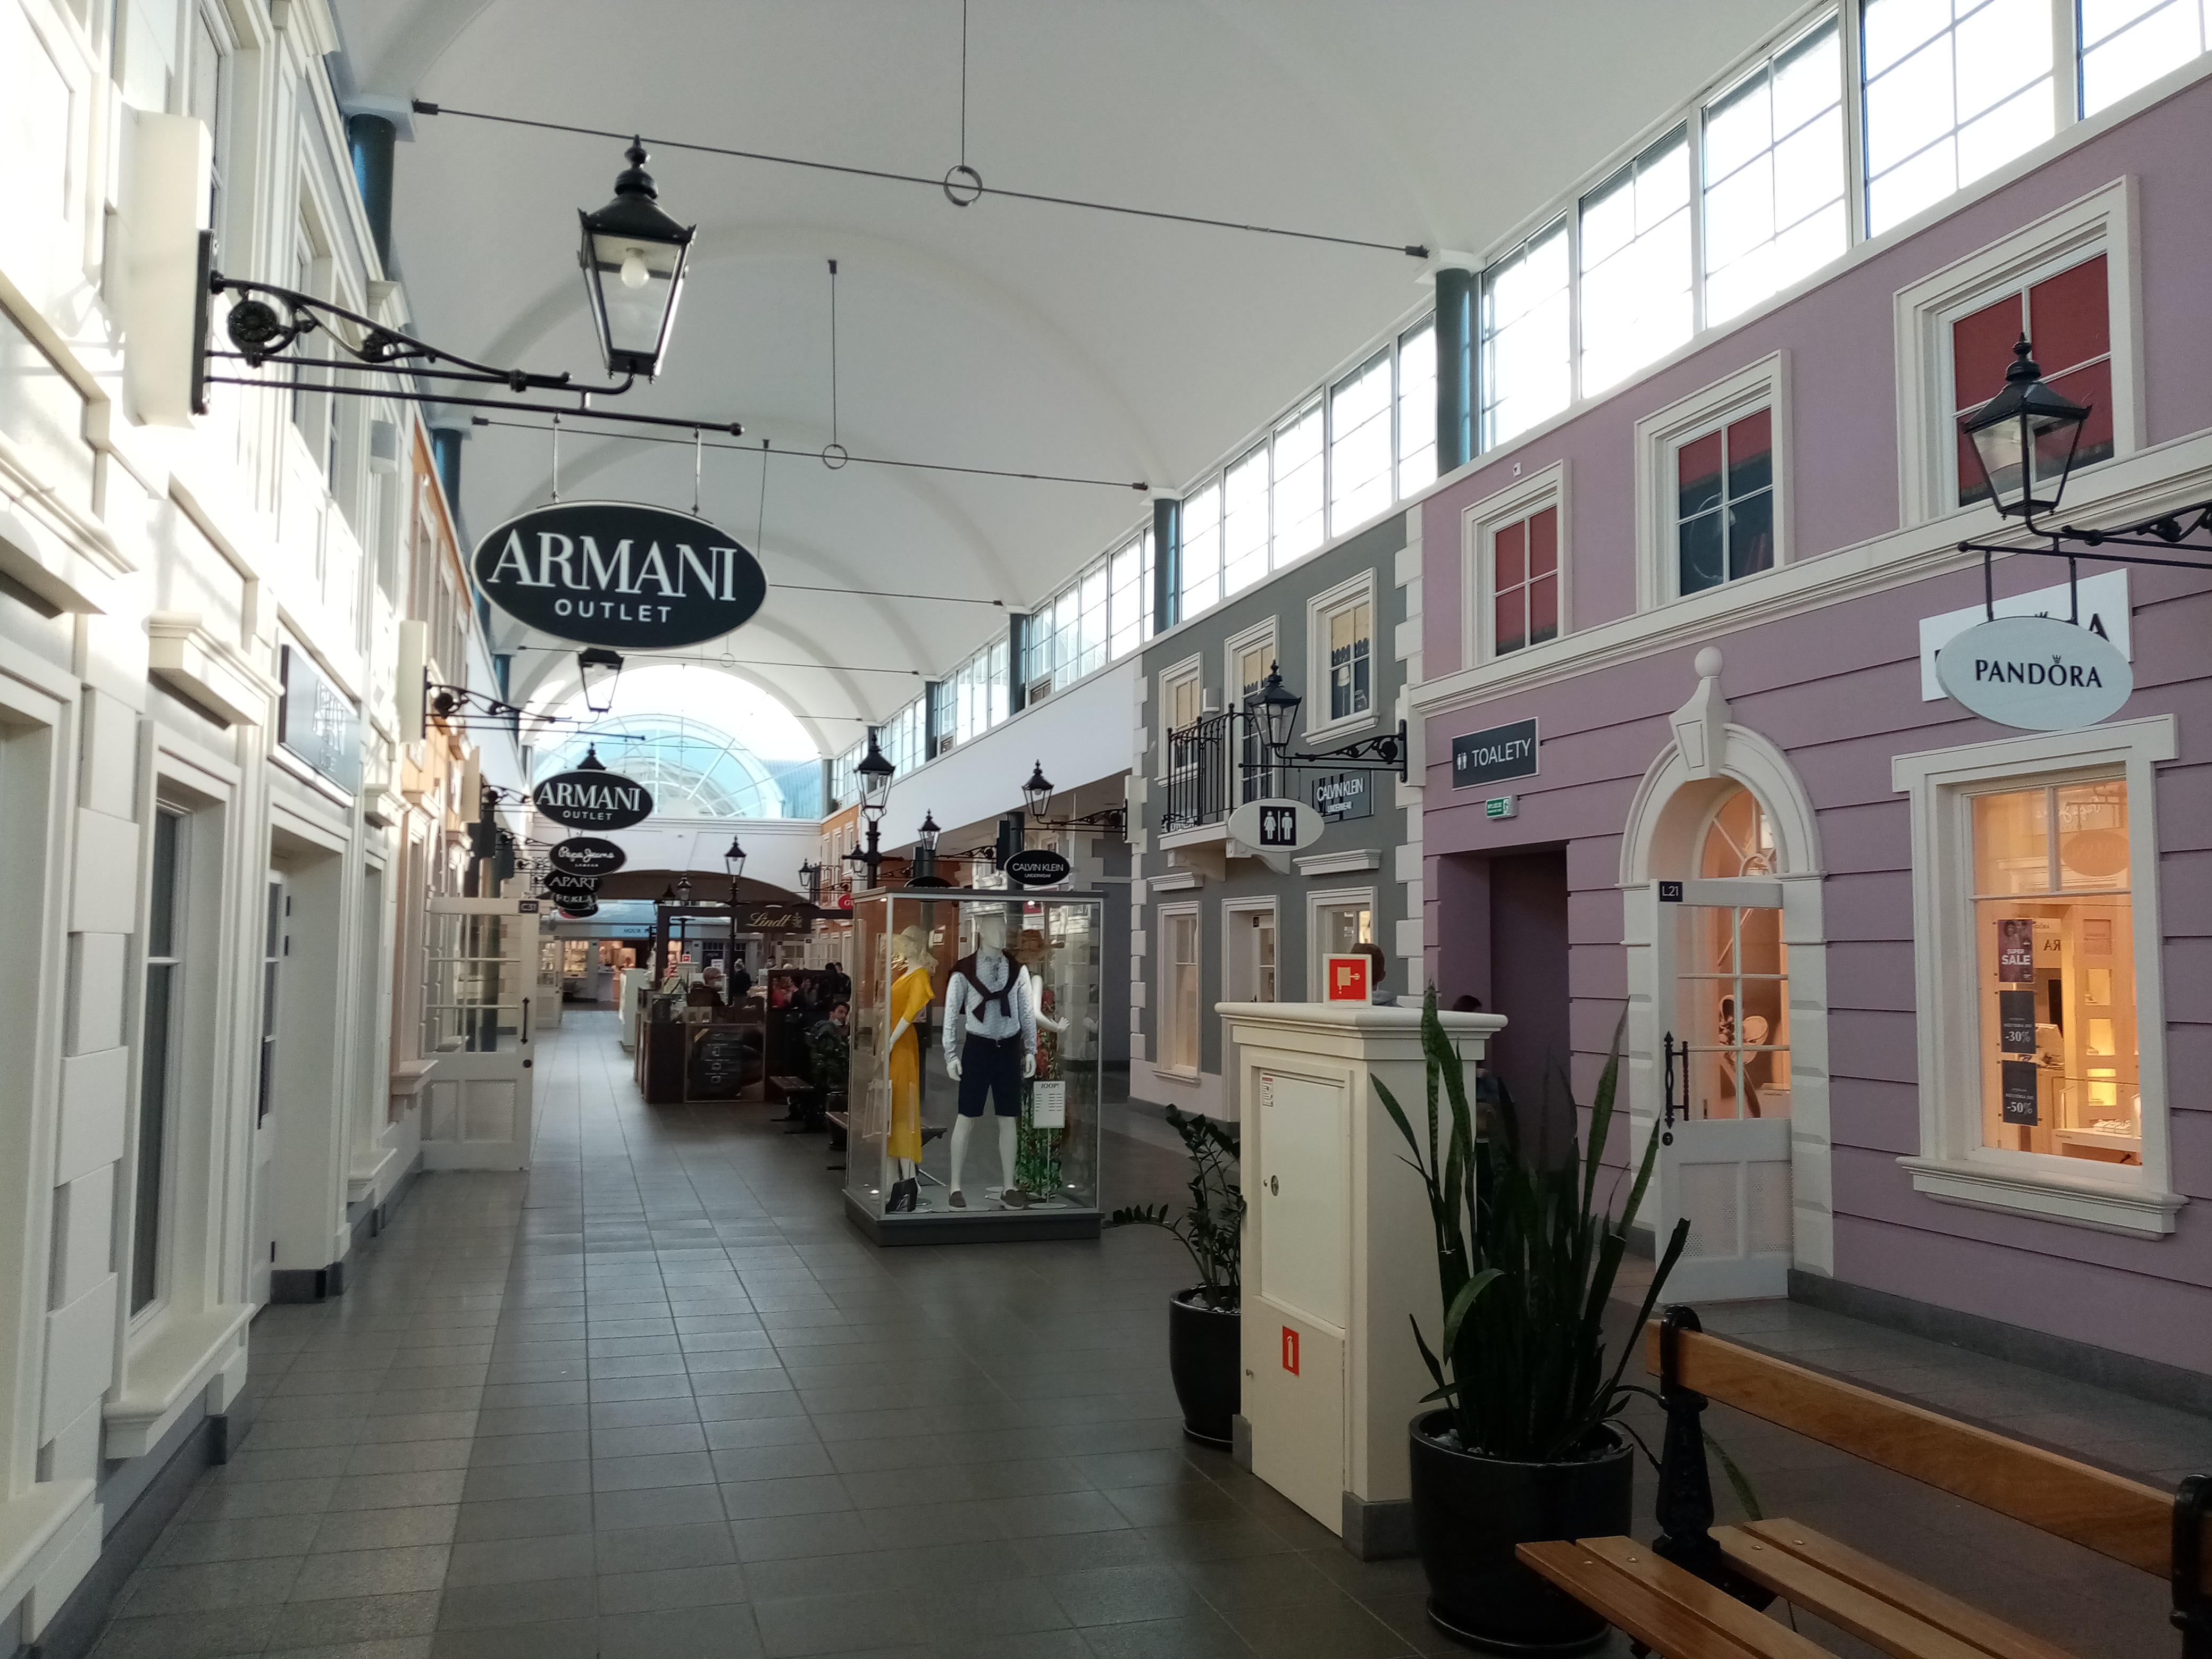 File:Fashion House Shopping Mall, Piaseczno (4).jpg - Wikimedia ...